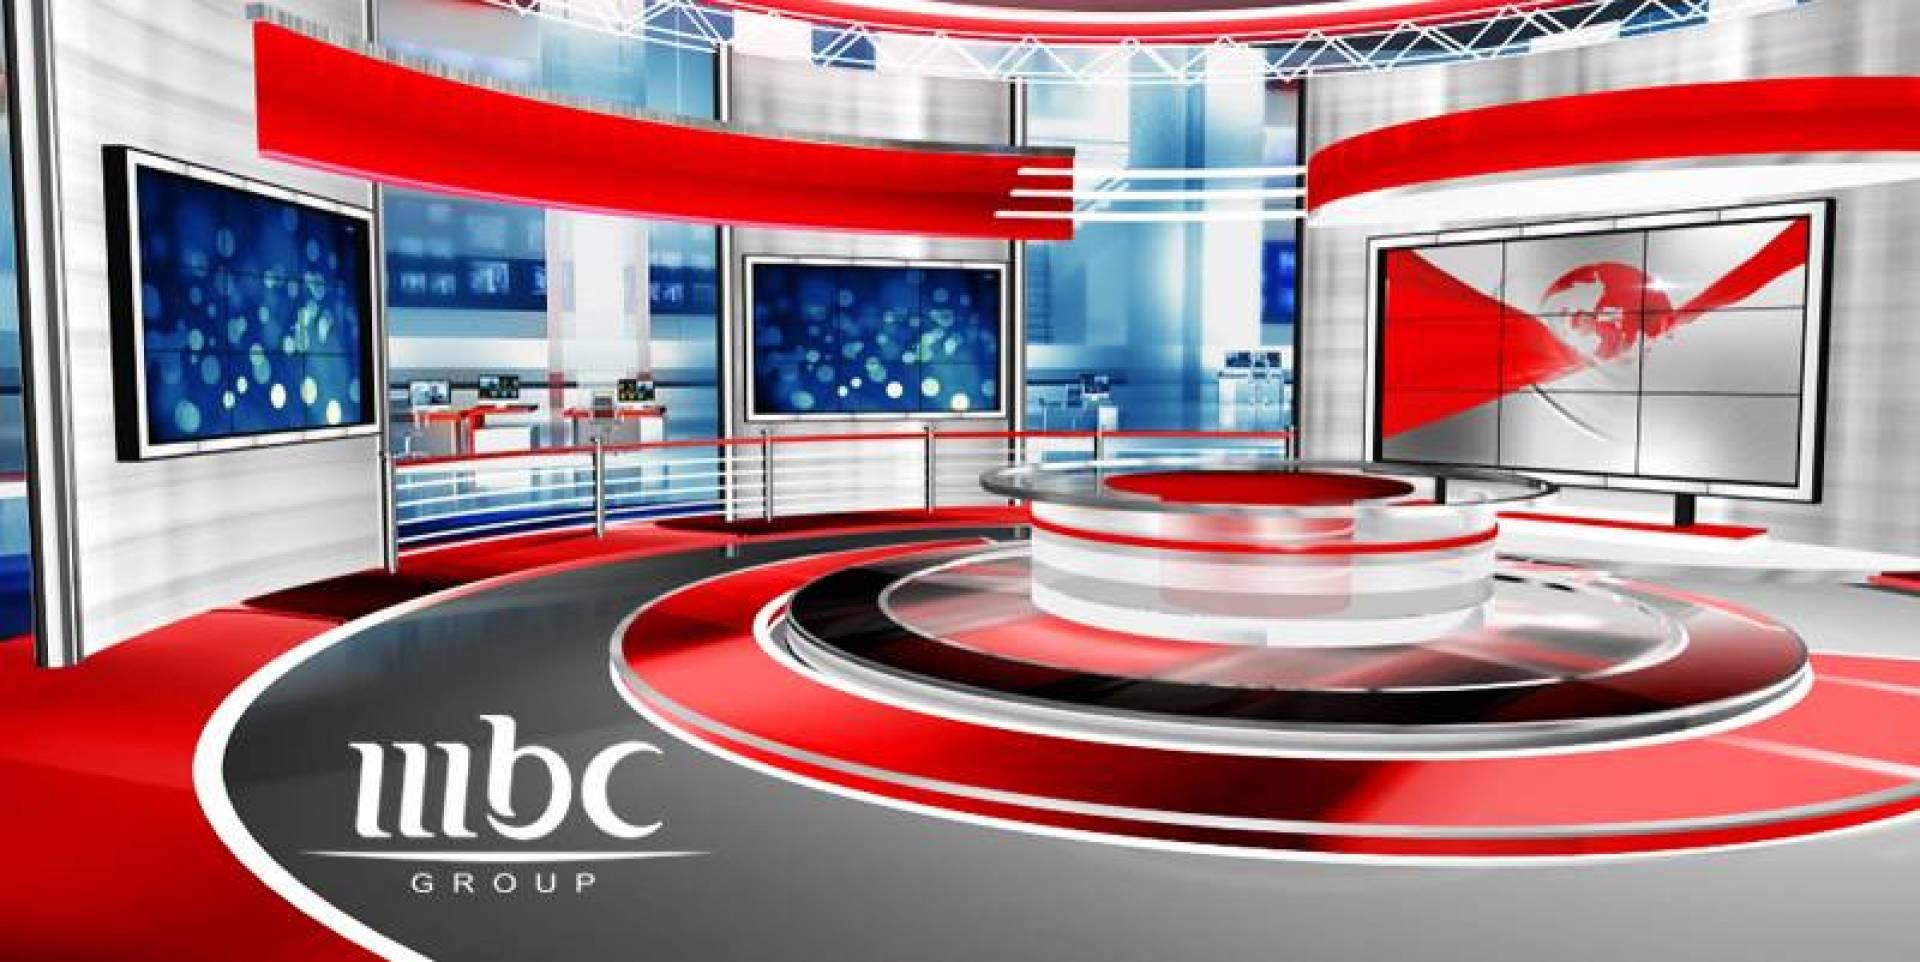 mbc.. تخطط للاستحواذ على سوق الإعلانات في السعودية